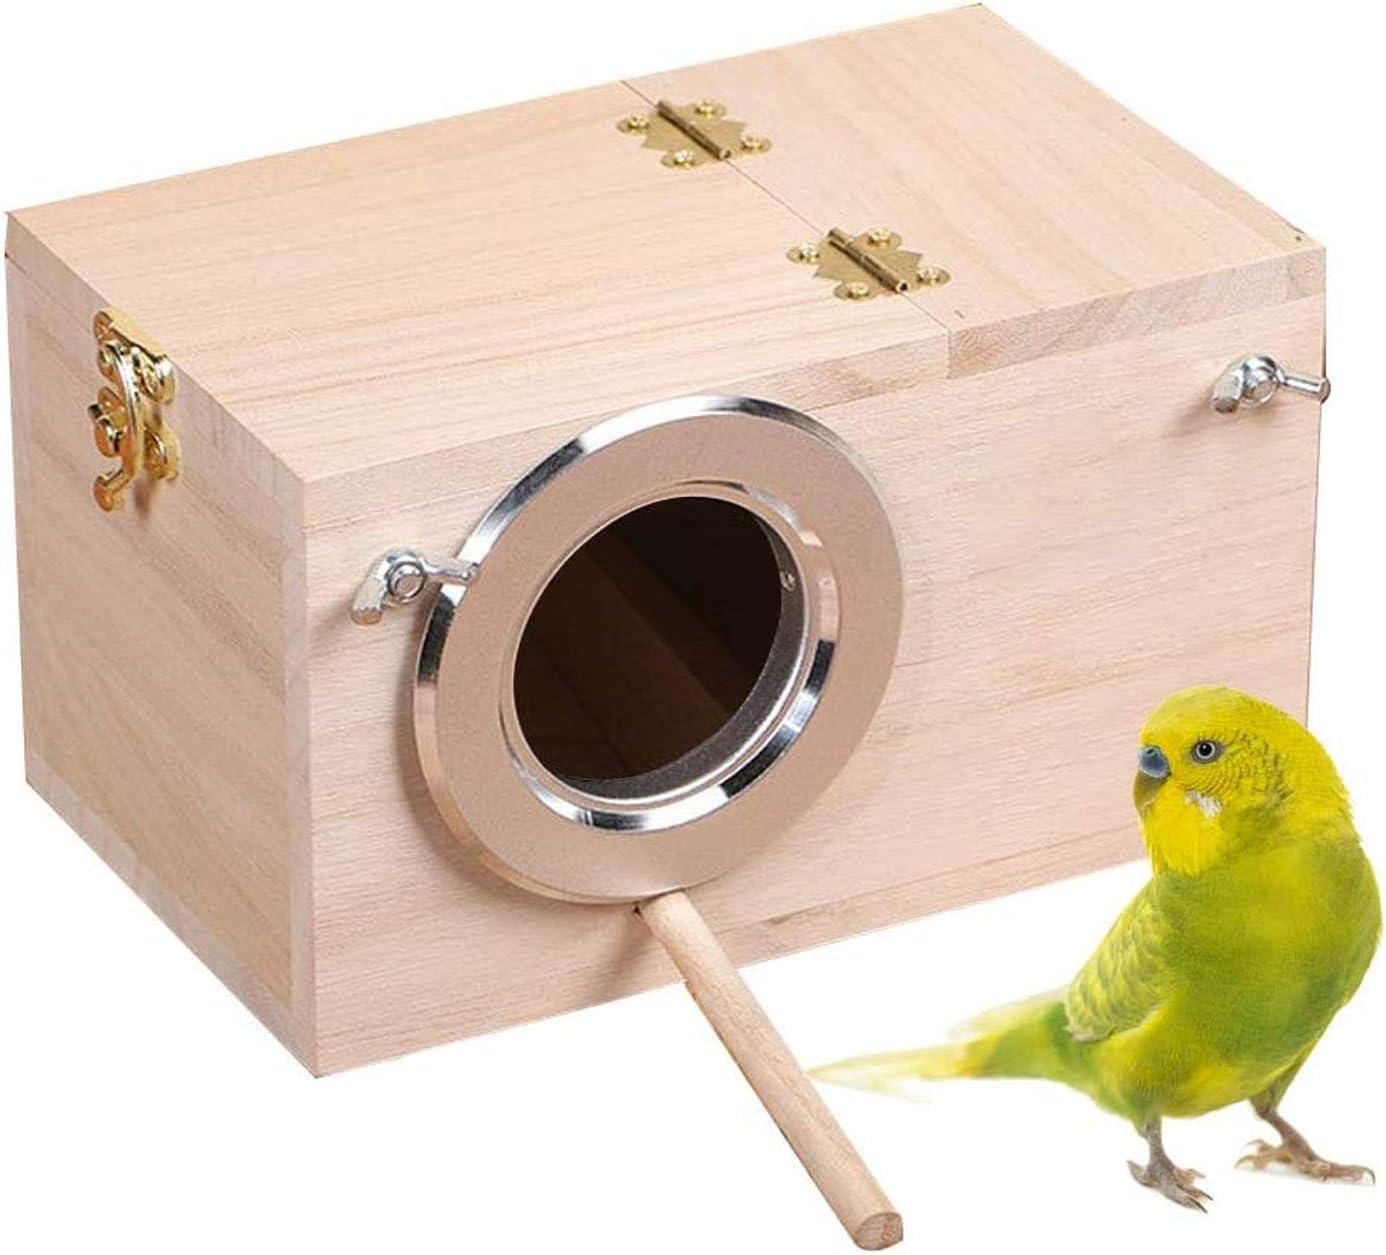 Tfwadmx Parakeet Nesting Fixed price for sale Box Bird Breeding Wood Nest Super intense SALE H Cage